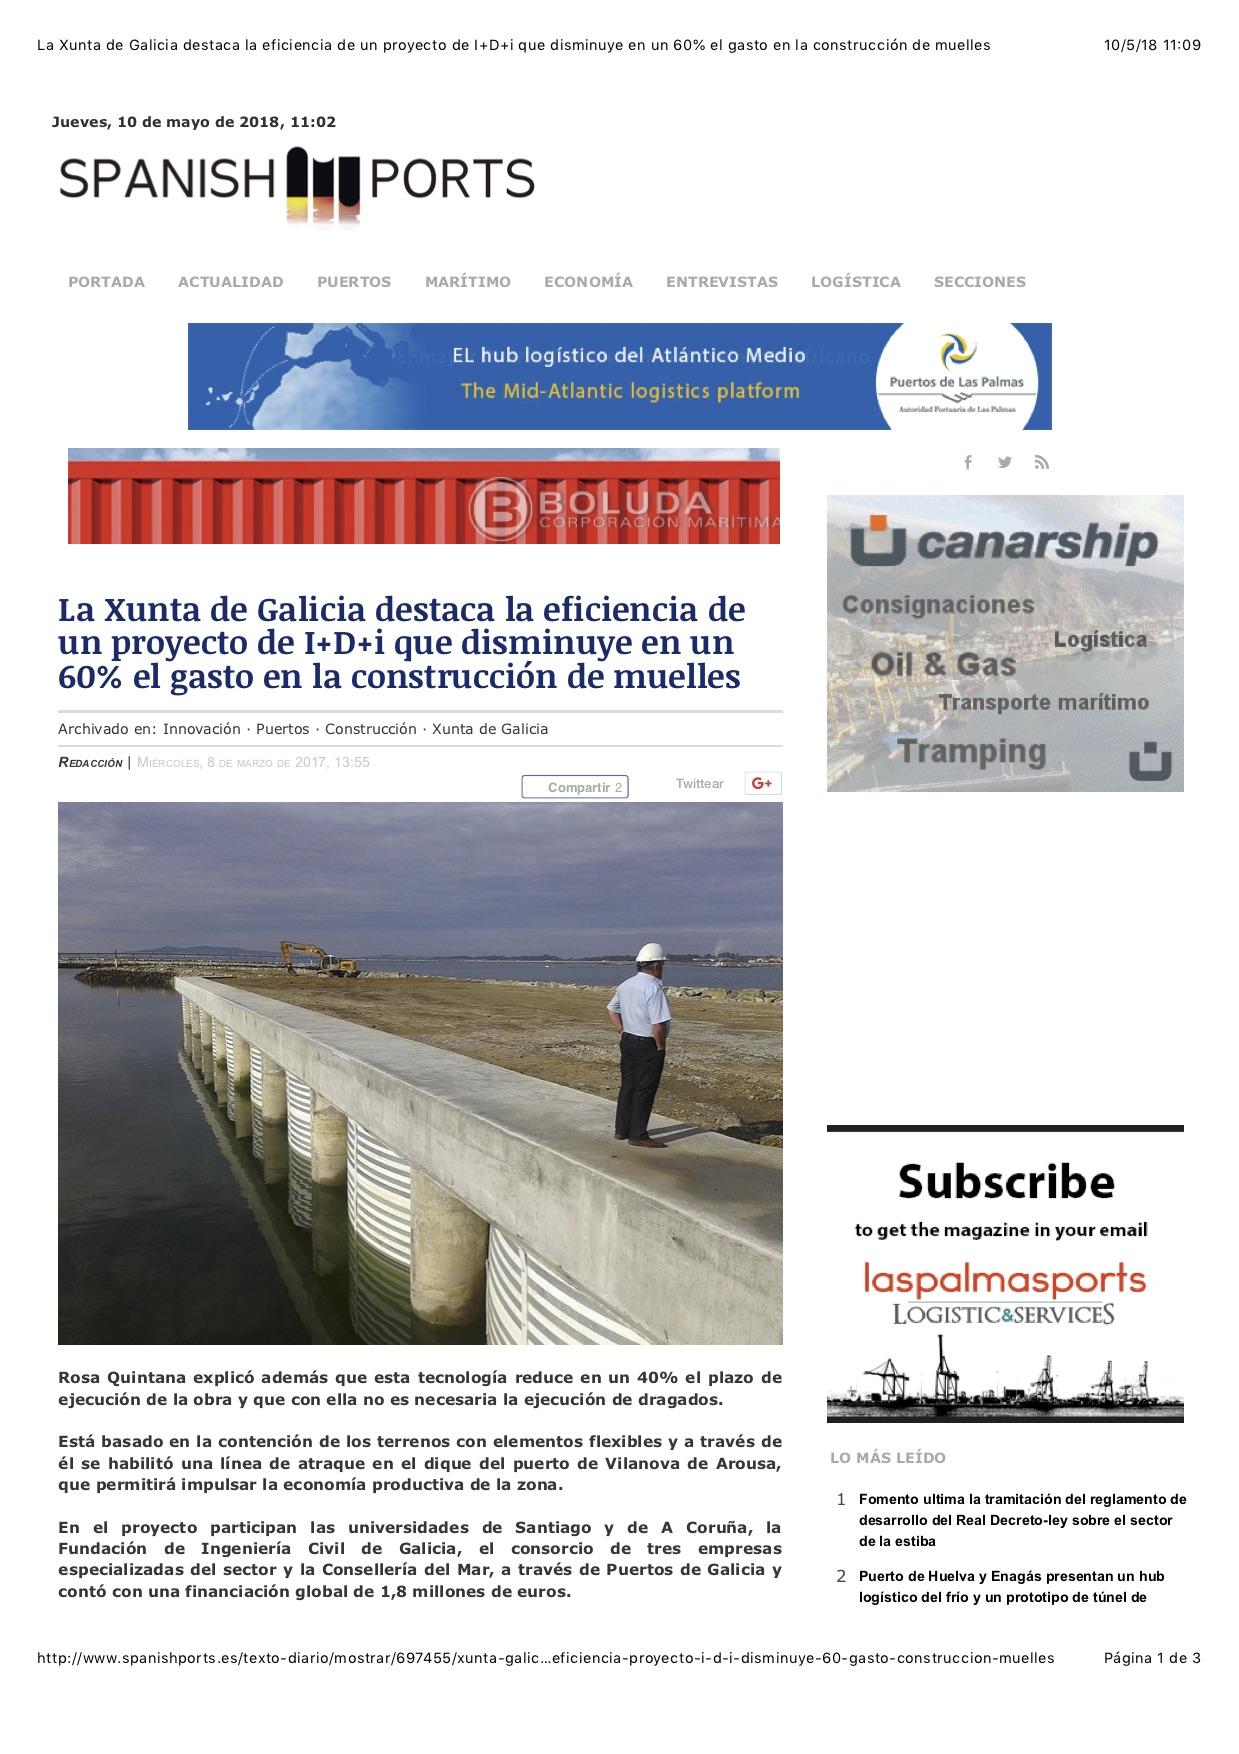 Xunta de Galicia eficiencia